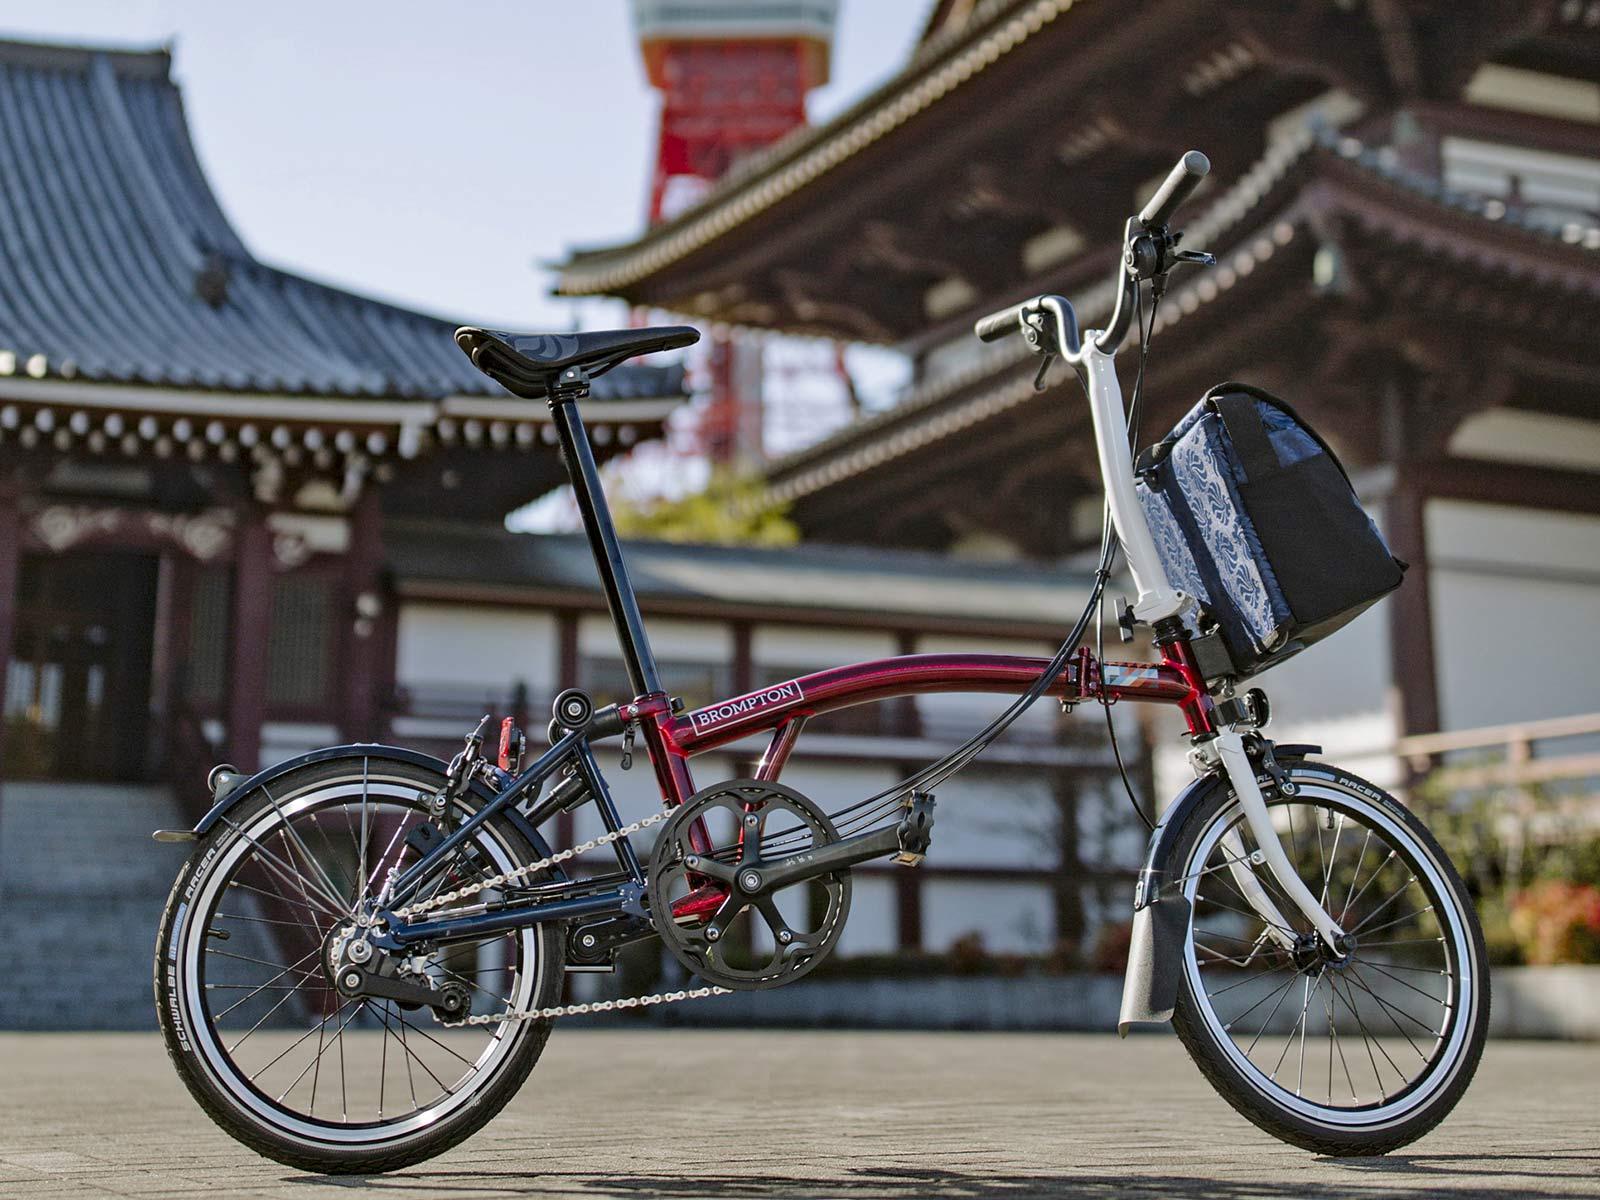 Brompton x Team GB folding bike, Tokyo 2020 Olympic limited edition, Japan